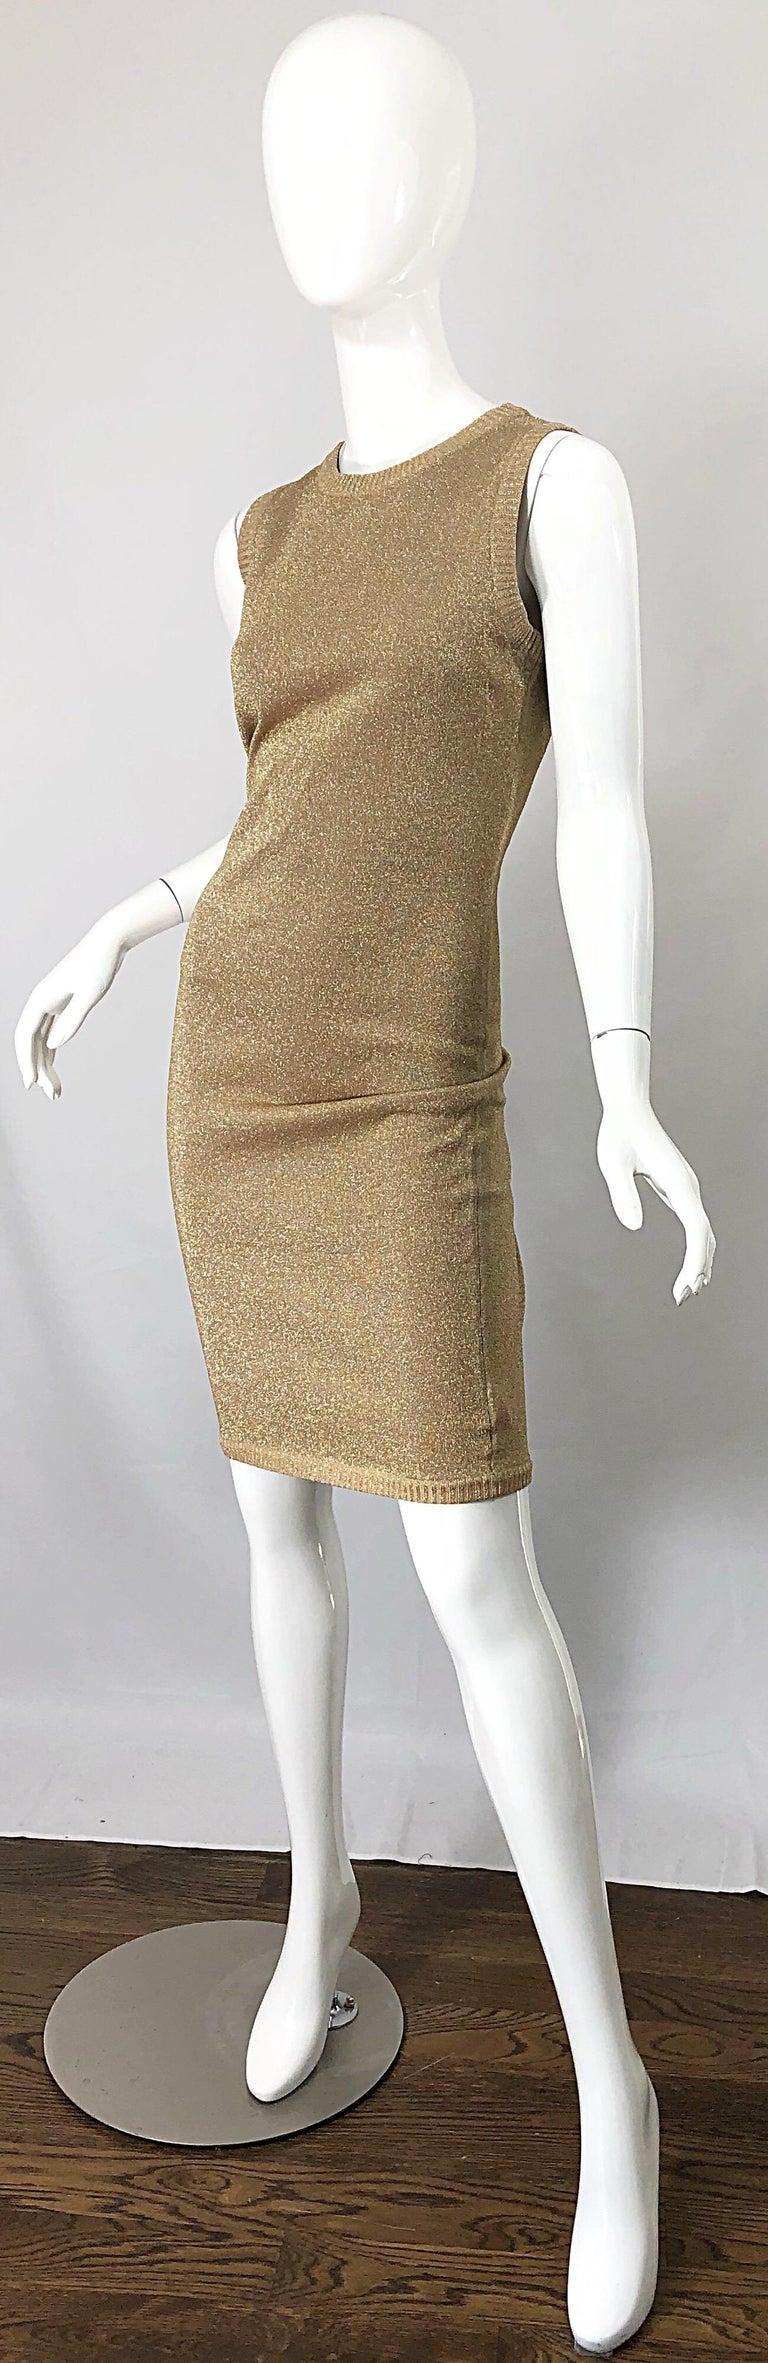 Mila Schoon 1990s Gold Metallic Cut - Out Back Vintage 90s Bodycon Dress For Sale 3